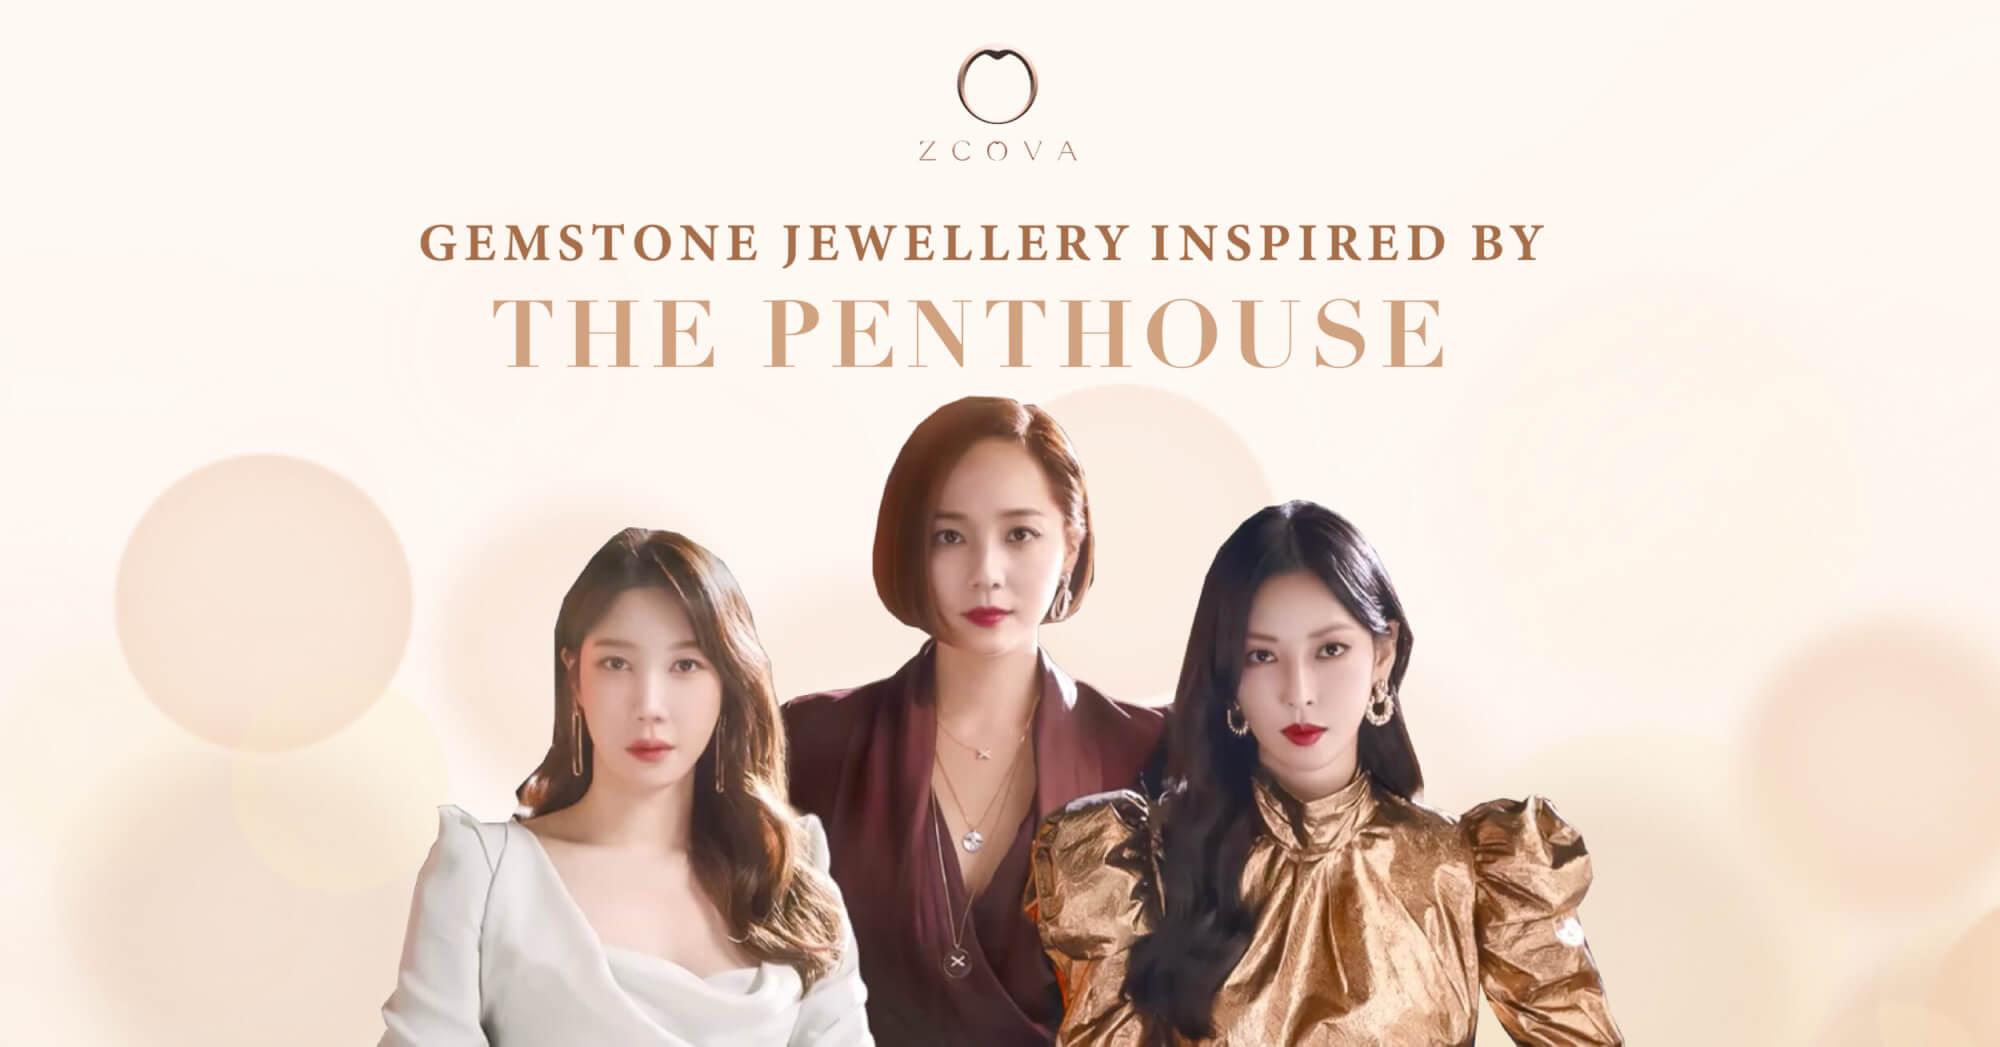 Gemstone jewellery inspired by kdrama penthouse